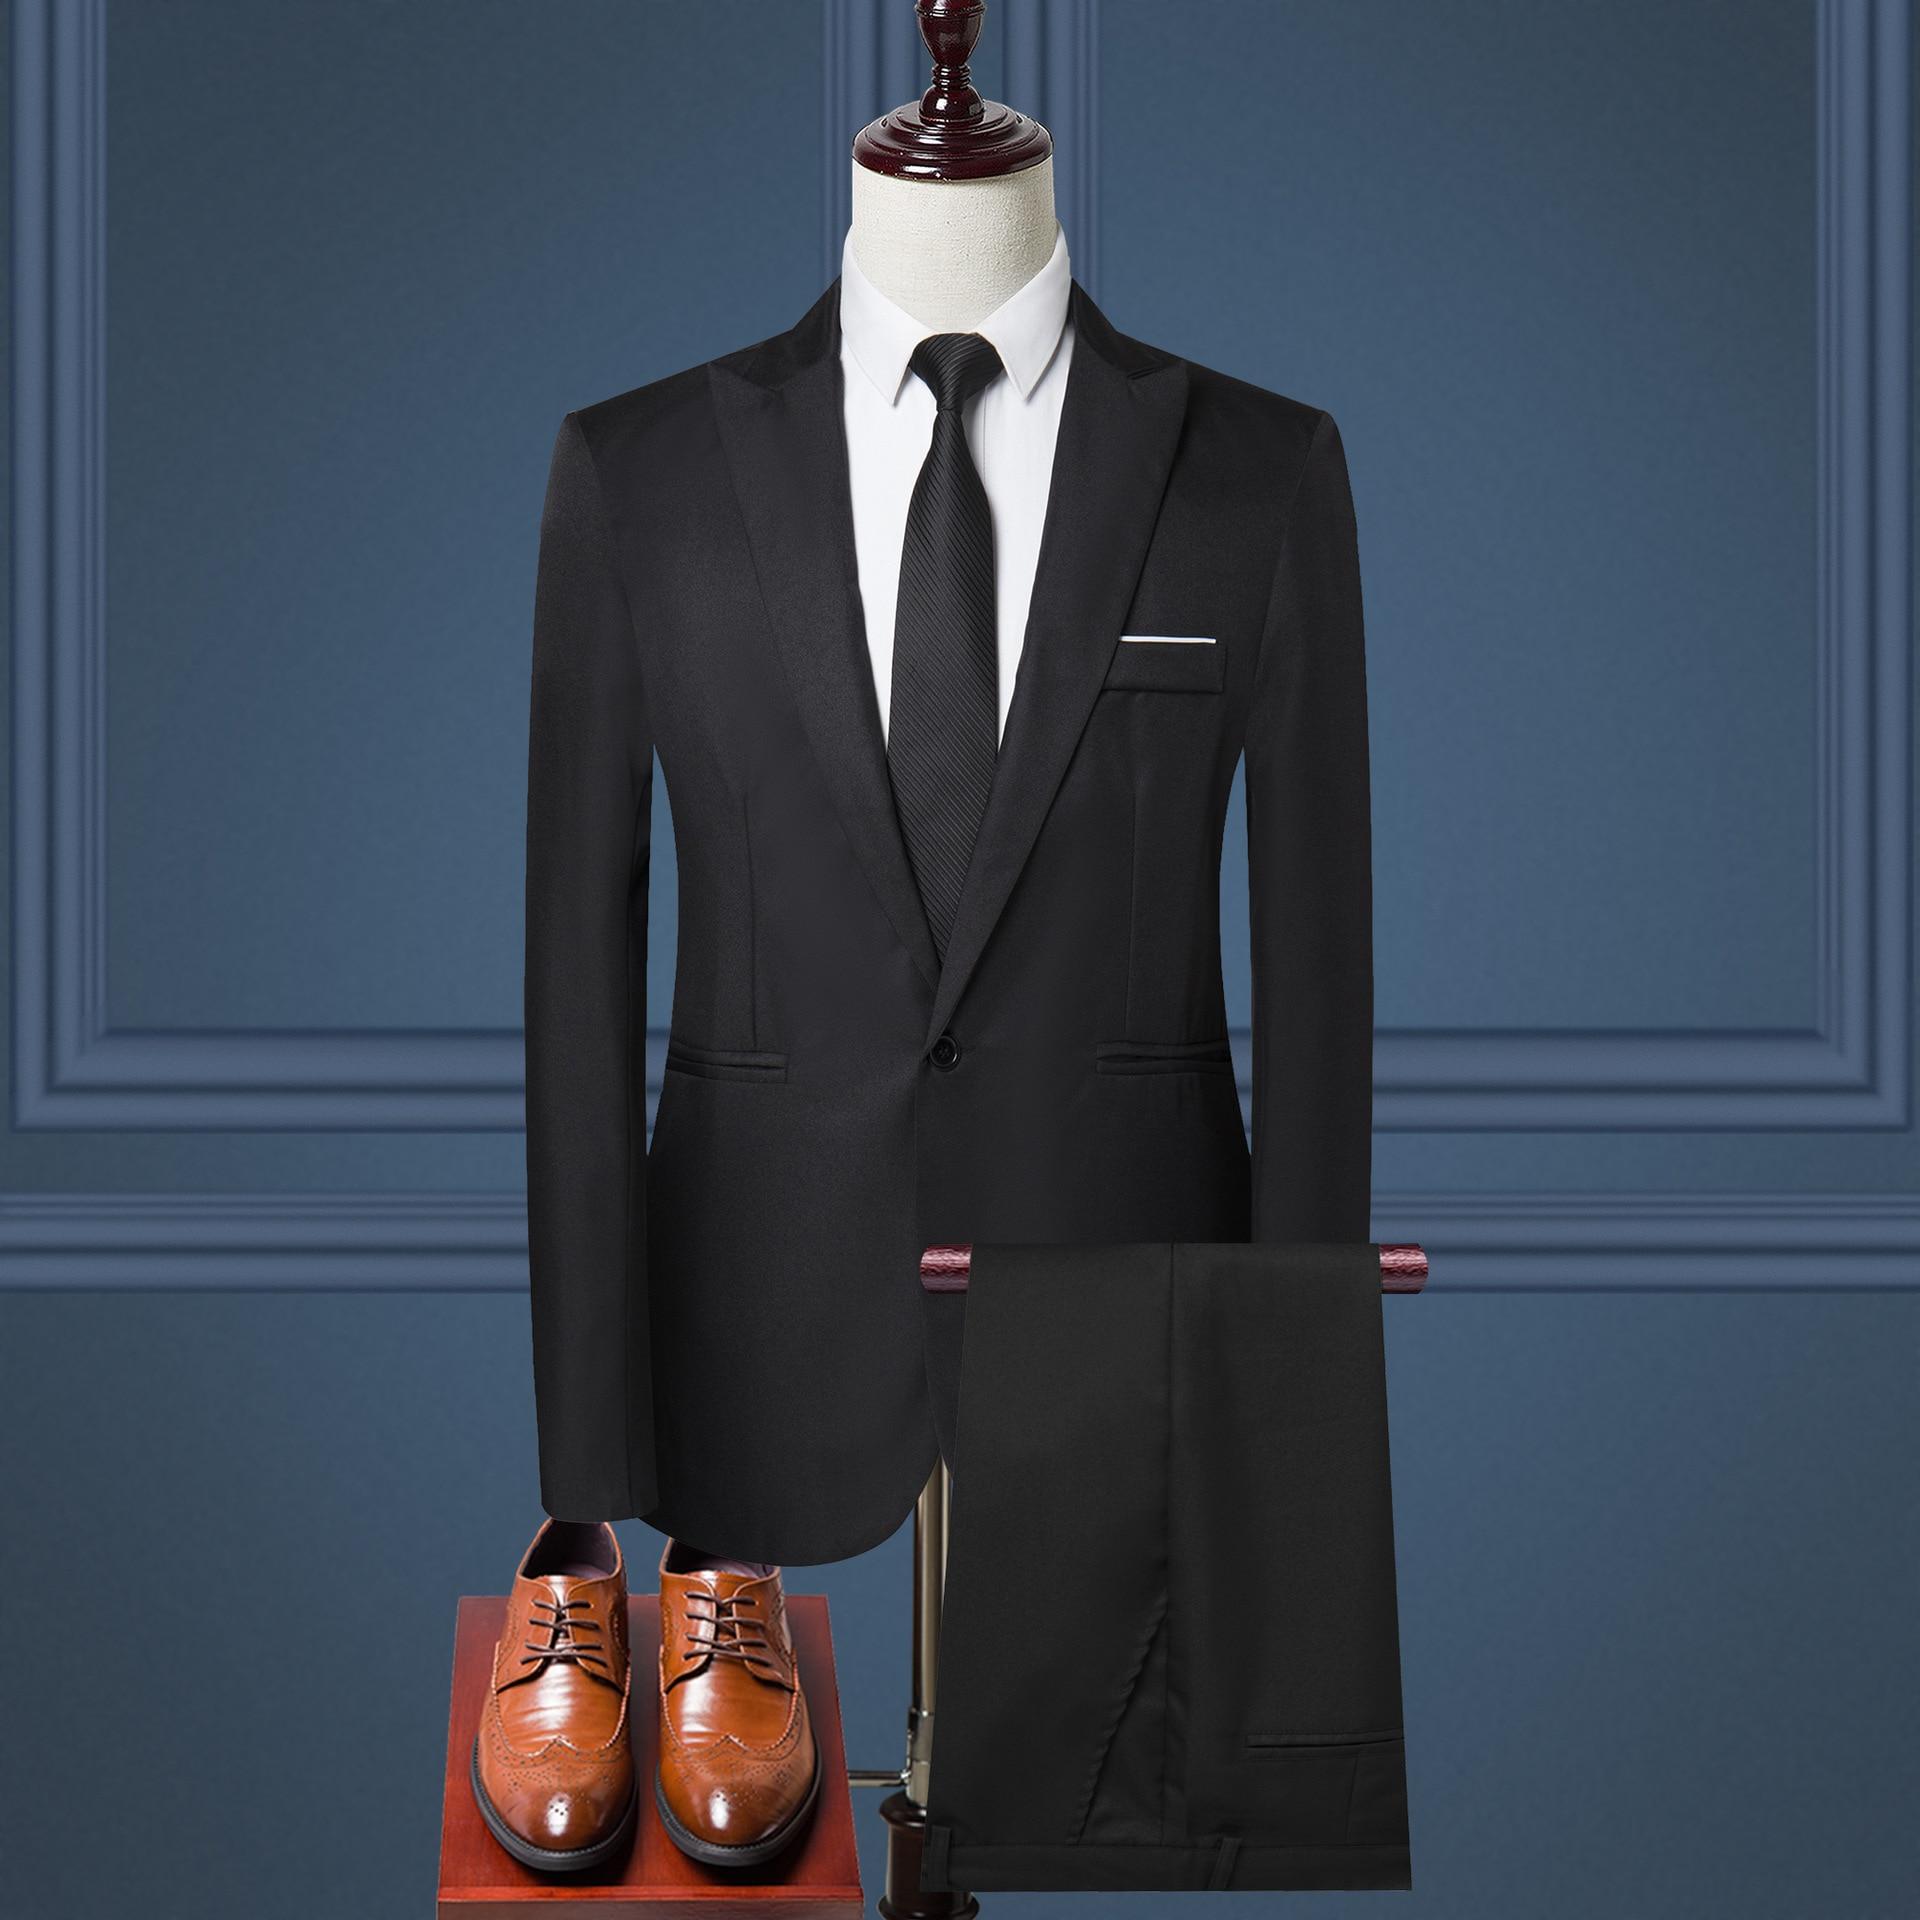 Men's Suit Two -piece Black Navy Suits Men Brand Slim Fit Groom Wedding Suit Korean Jacket Pants Trousers